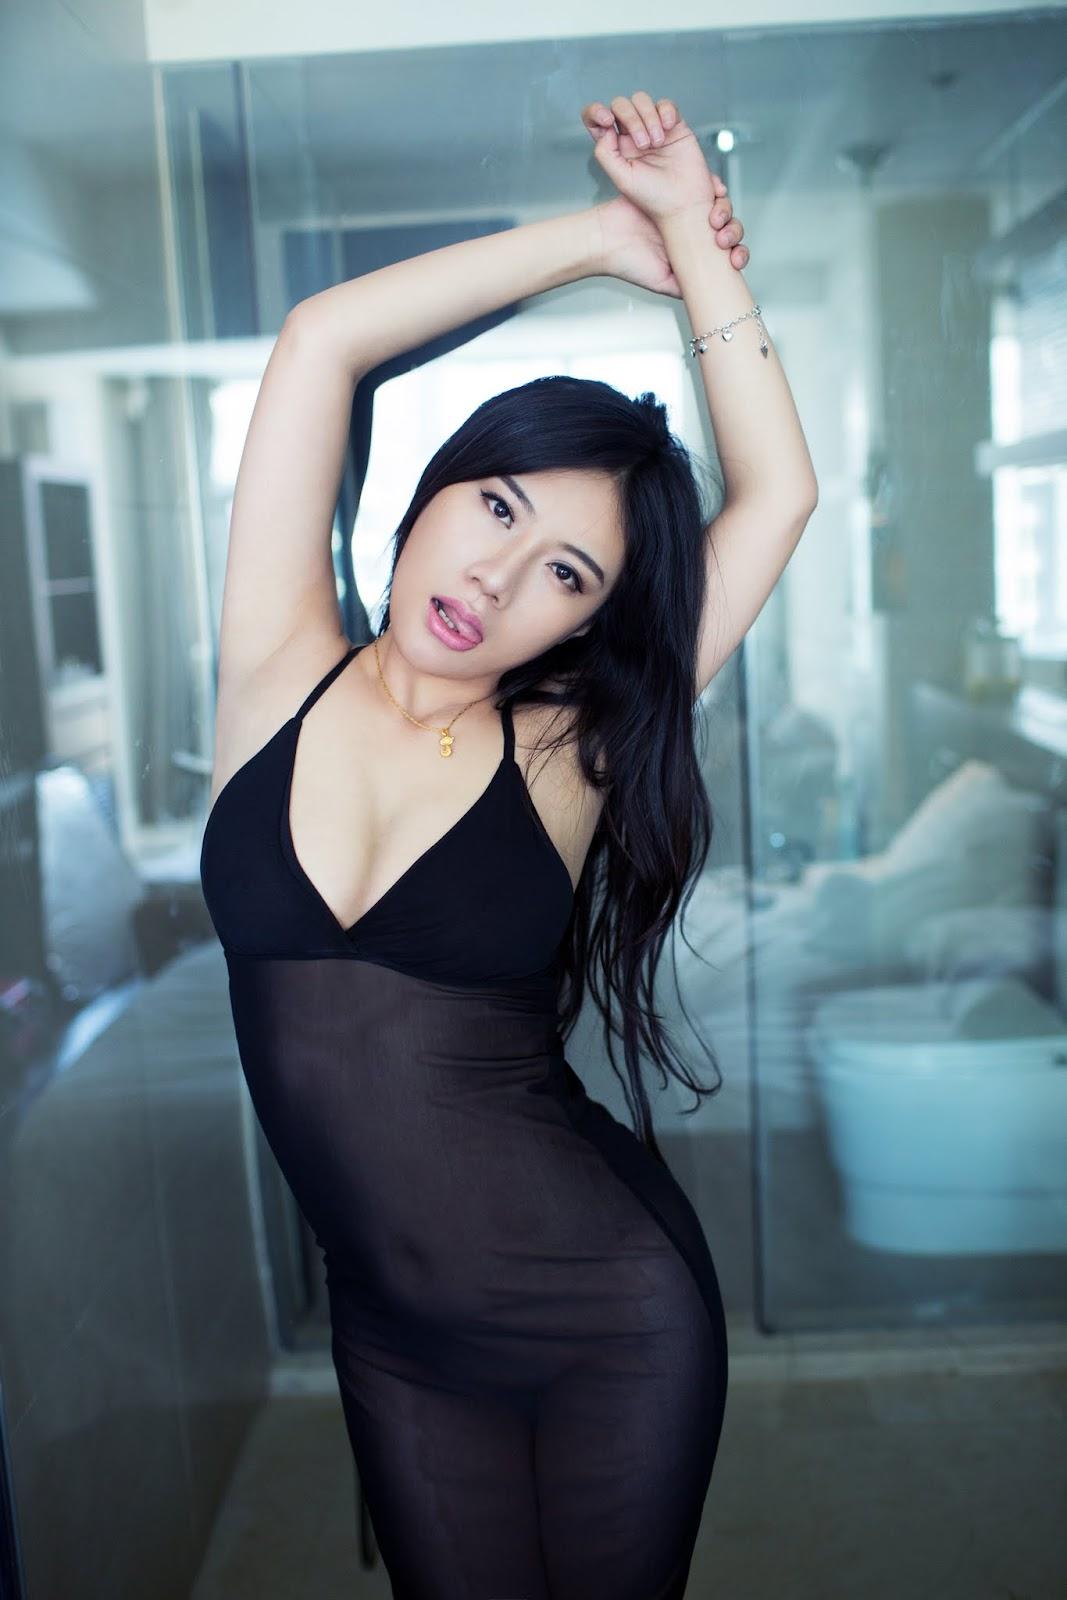 %25C2%25AC%252BO 31 - Hot Sexy Model TUIGIRL NO.46 Nude